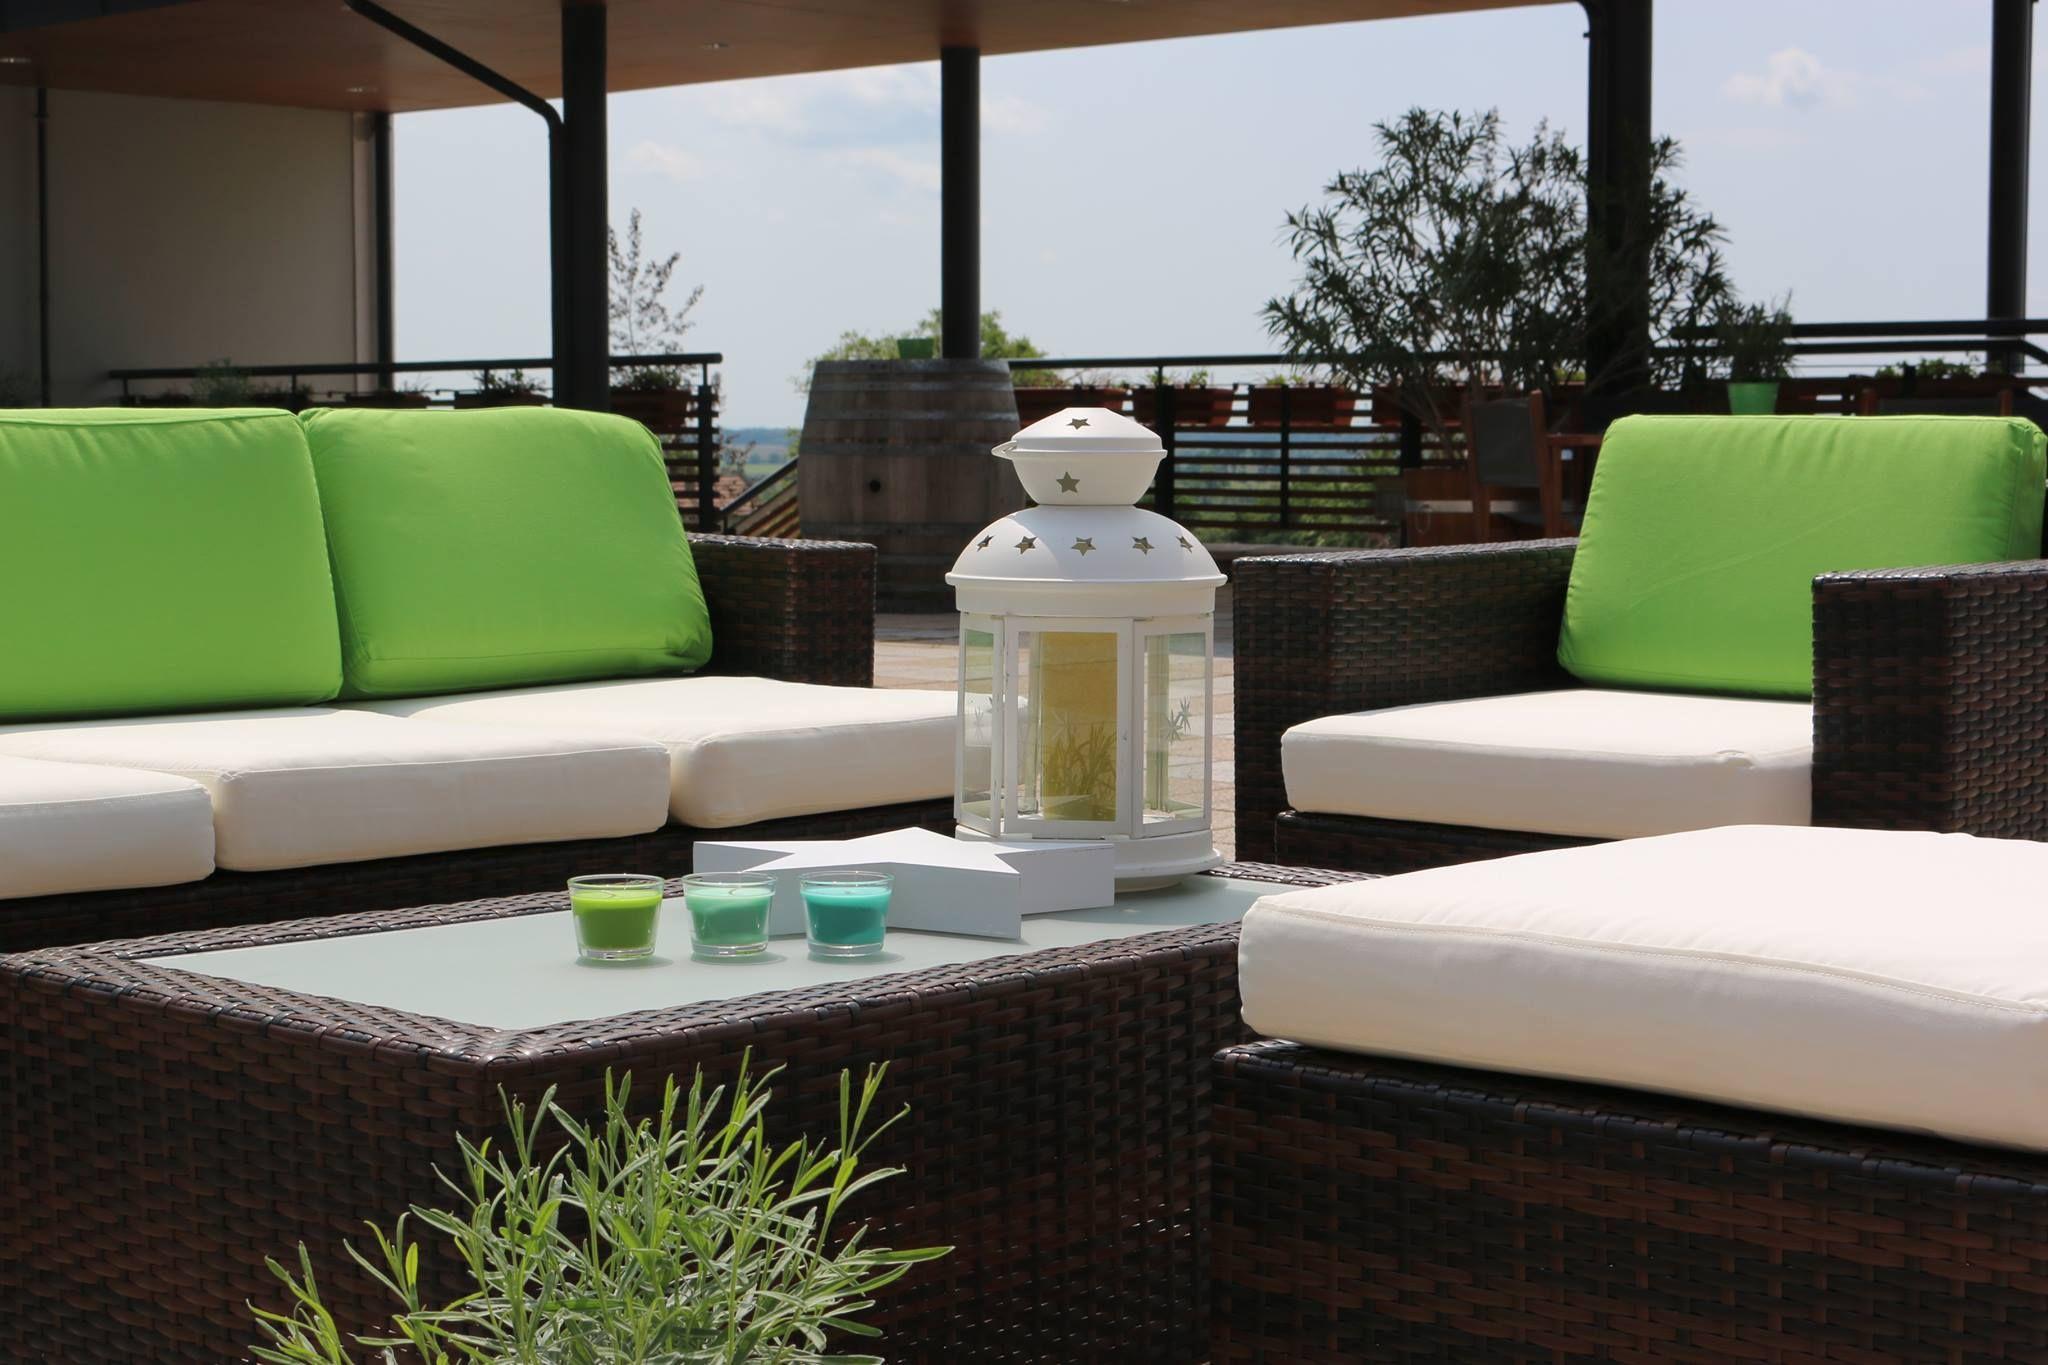 Tornai Pinceszet Gartenmoebel Auflagen Terrasse Gartenmobel Auflagen Gartenauflagen Gartenmobel